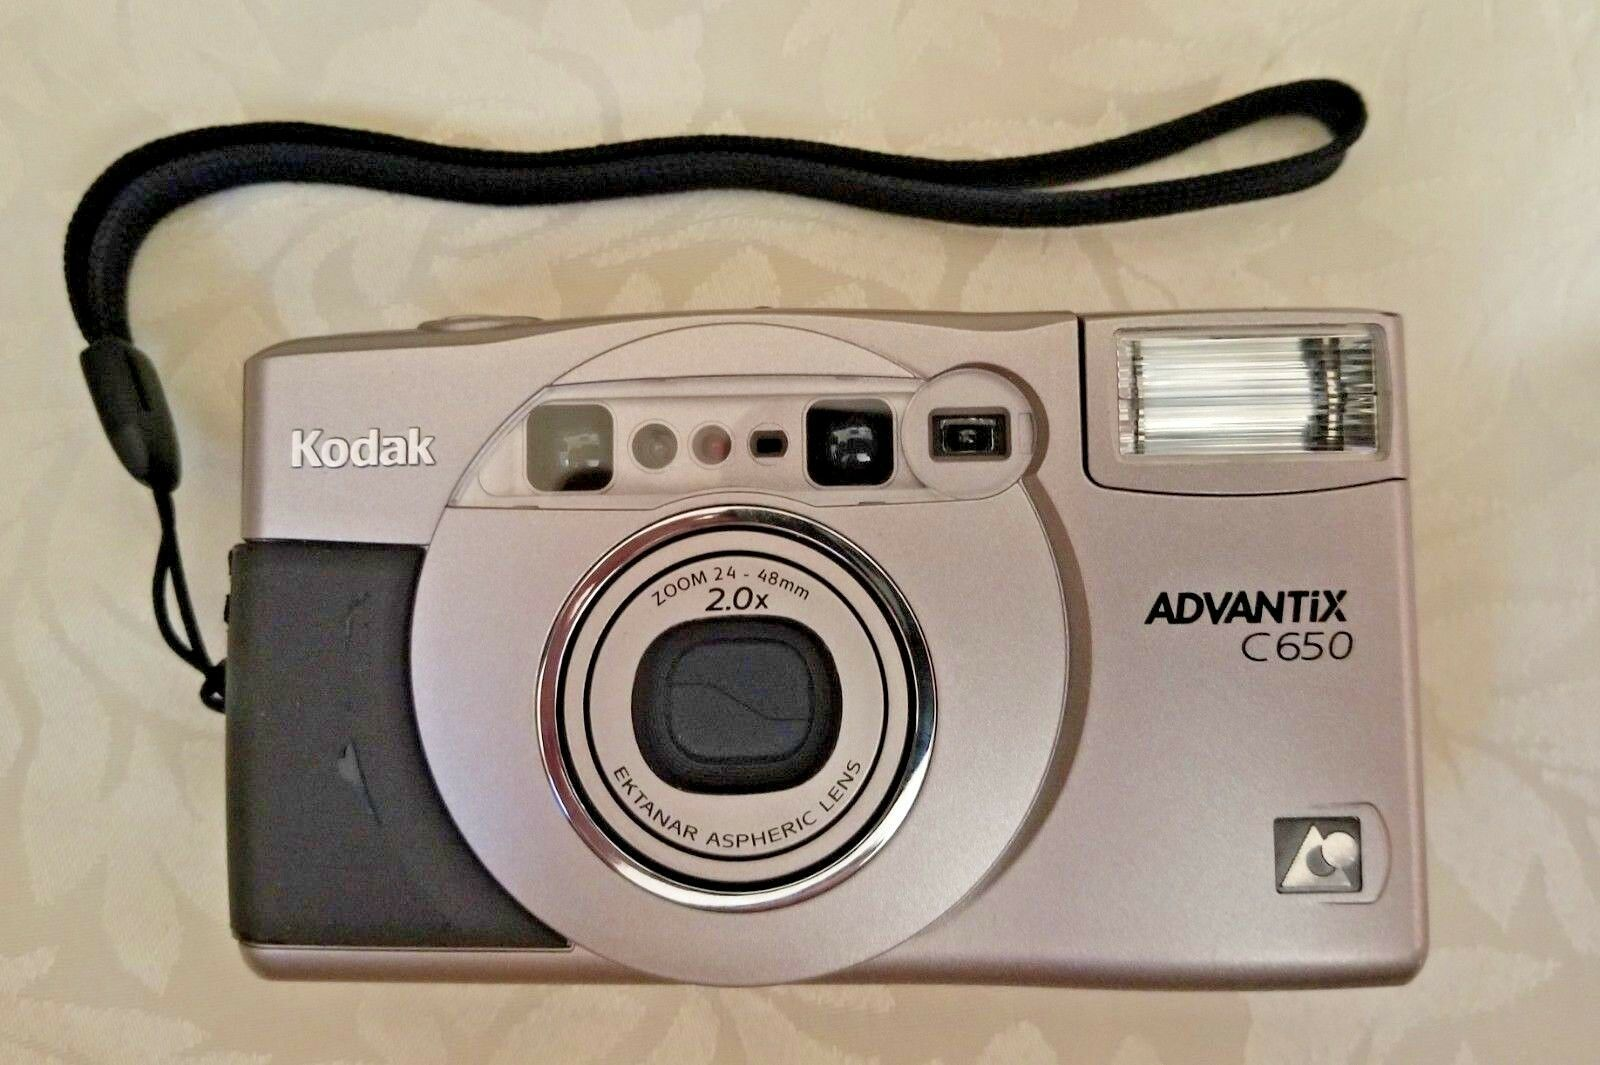 Kodak Advantix C650 Zoom APS Point & Shoot Film Camera